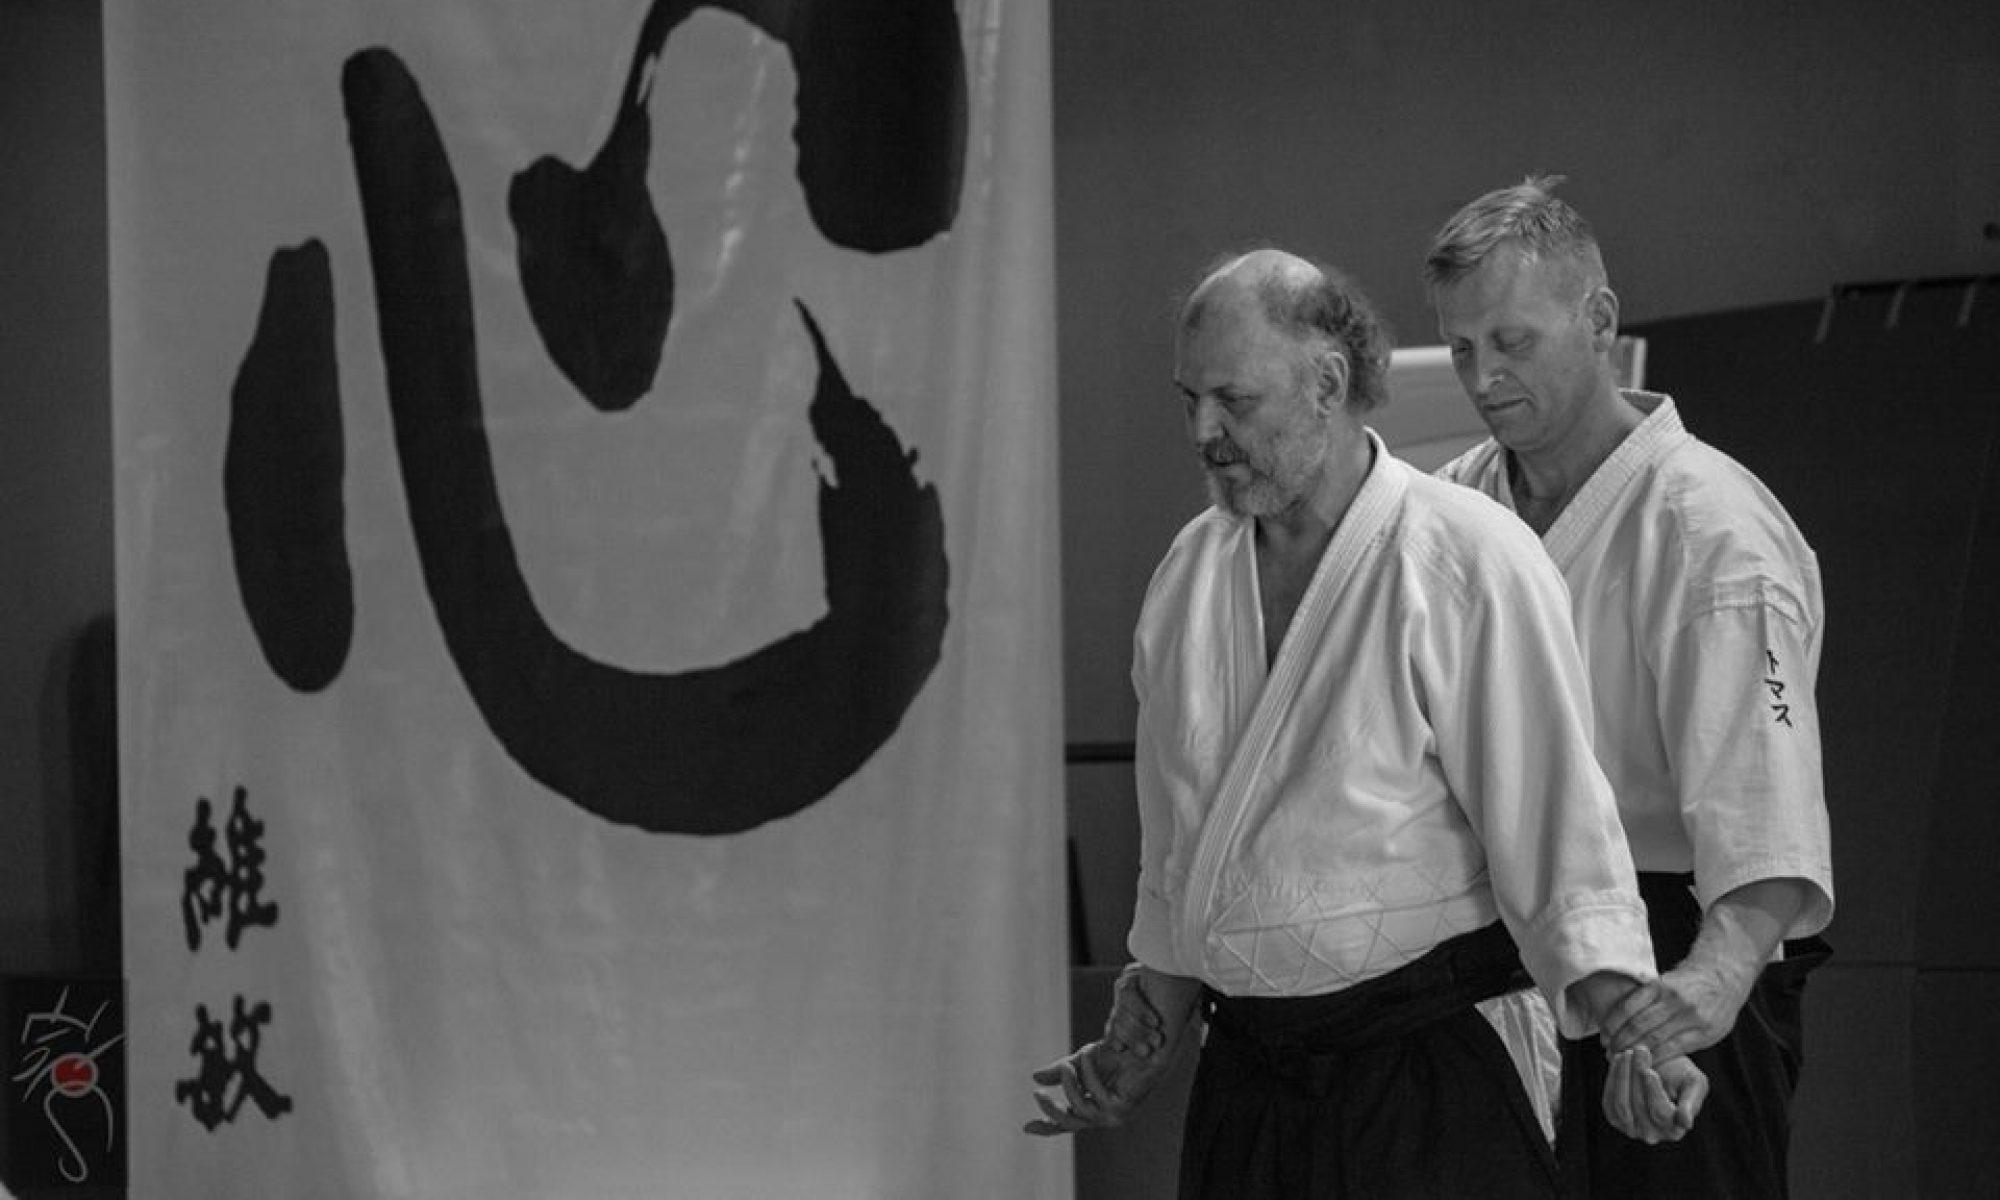 Aikido Yuishinkai Randers